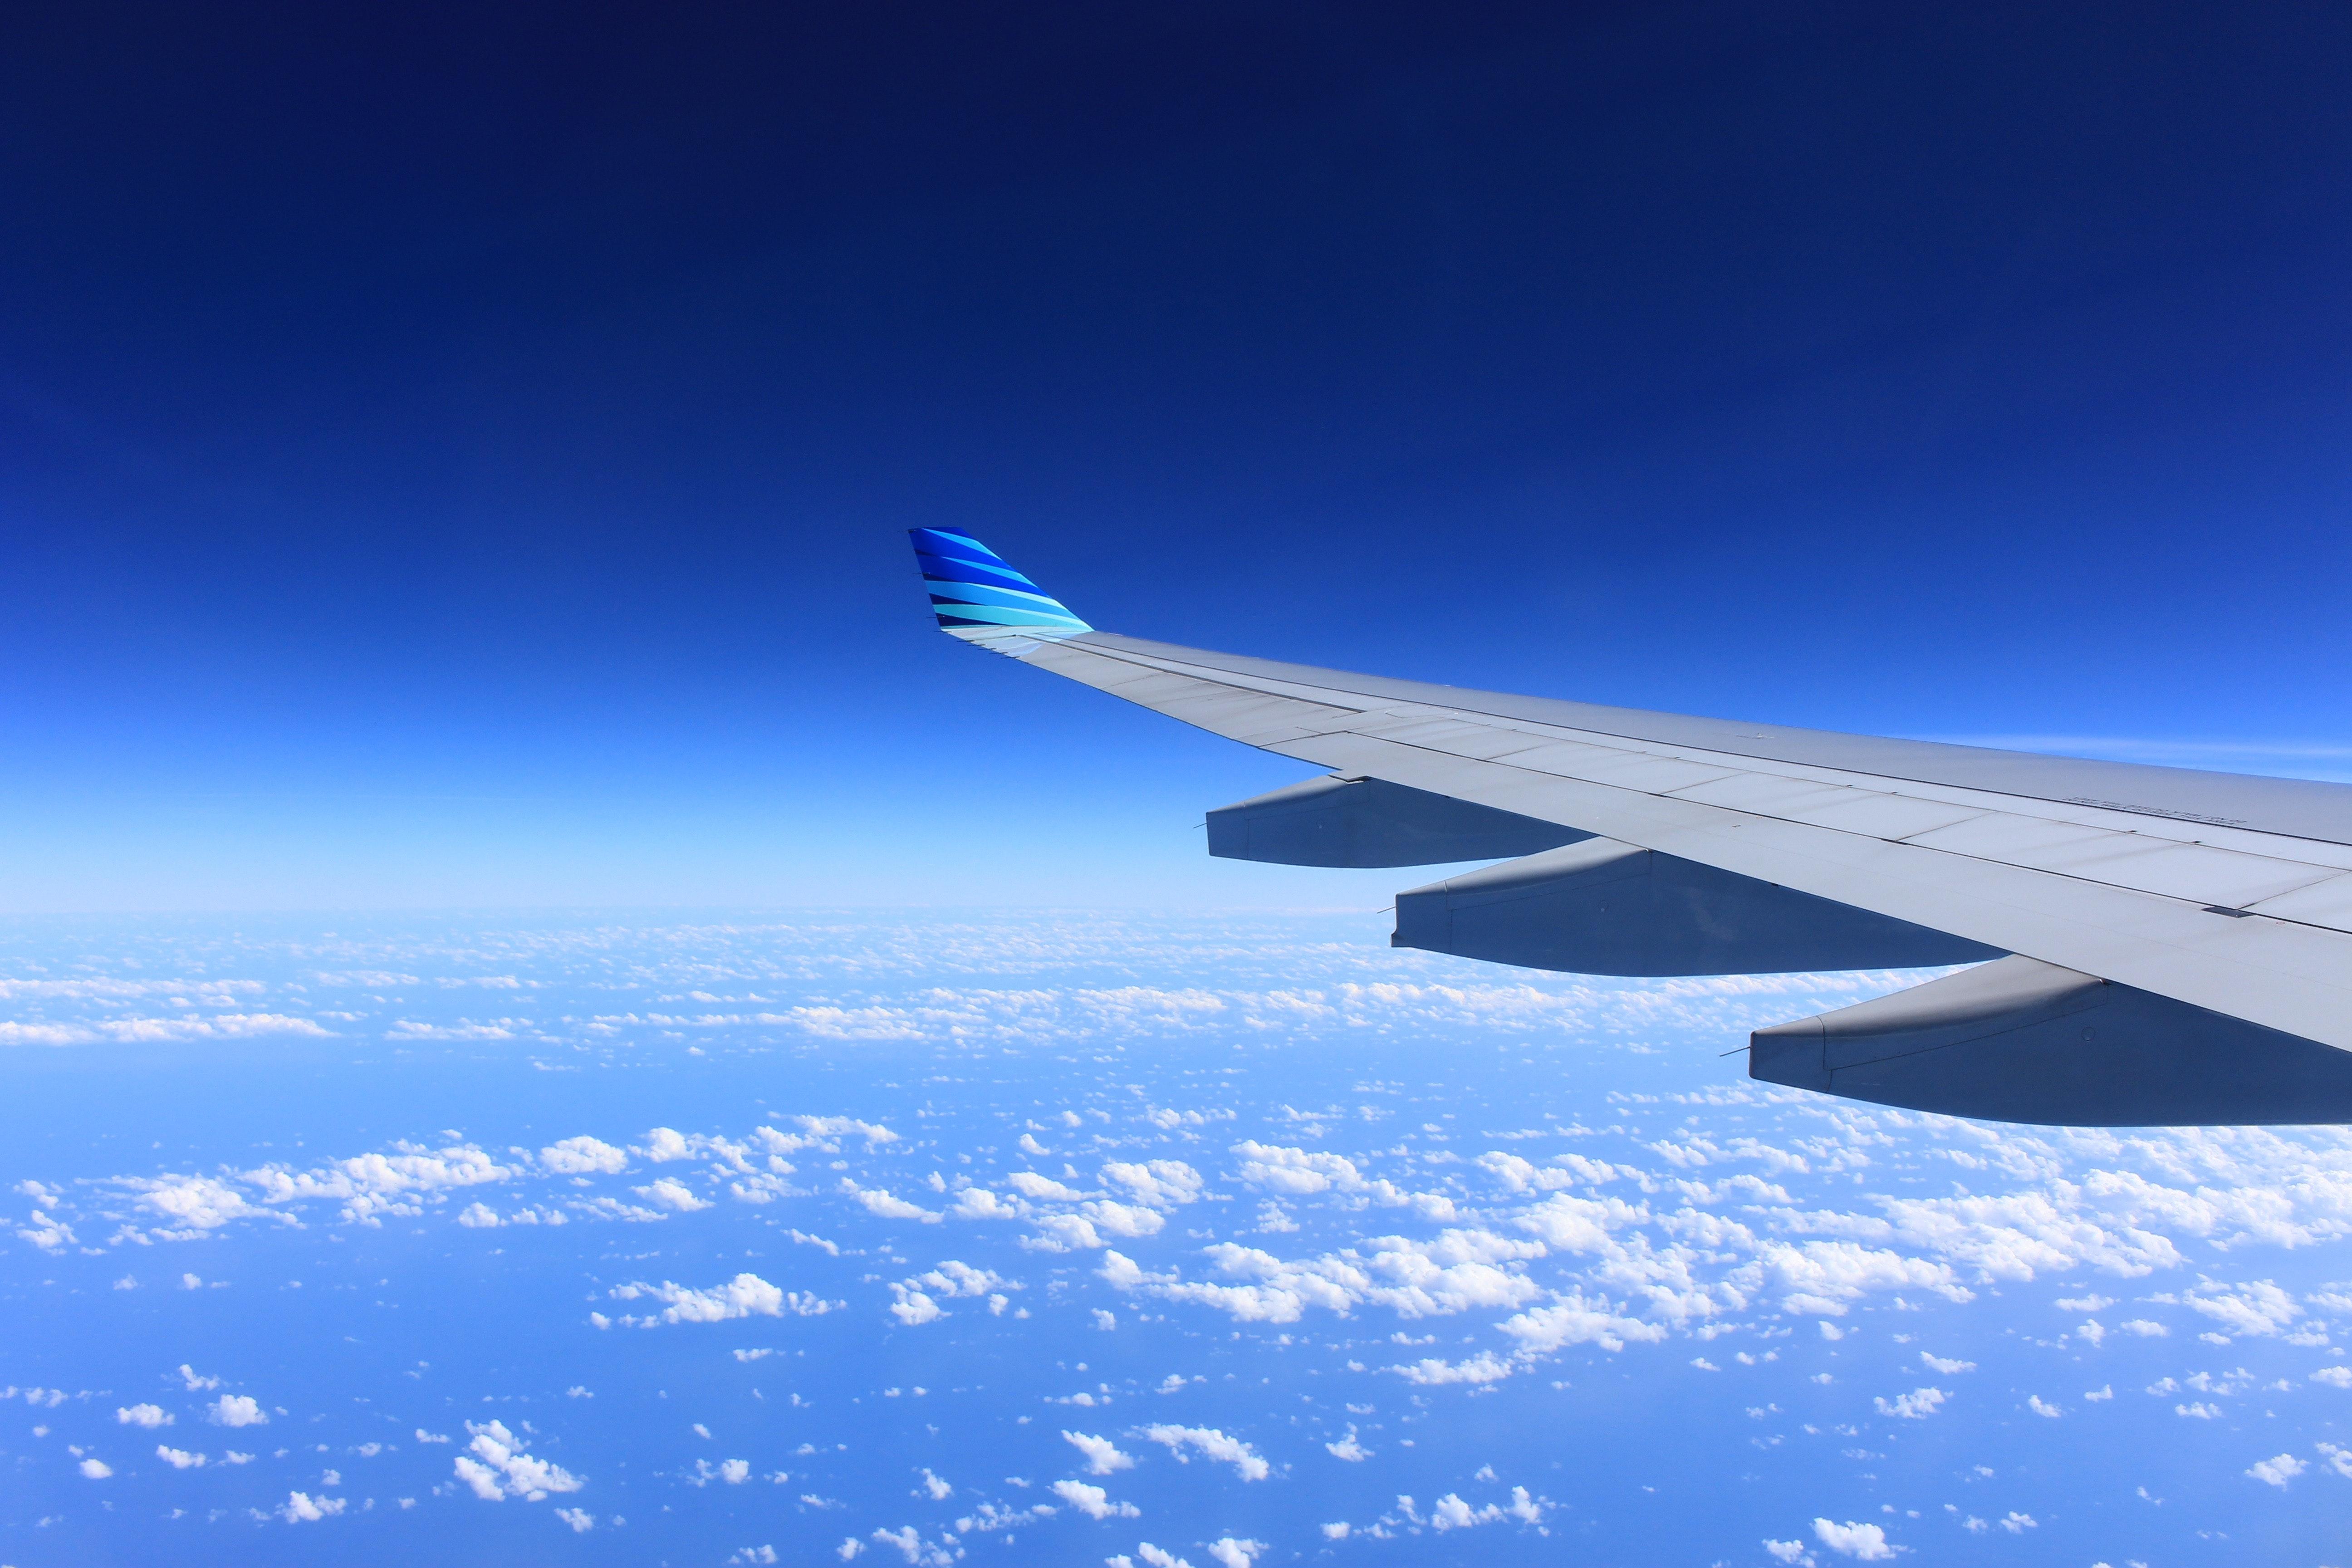 500 Engaging Airplane Photos Pexels Free Stock Photos